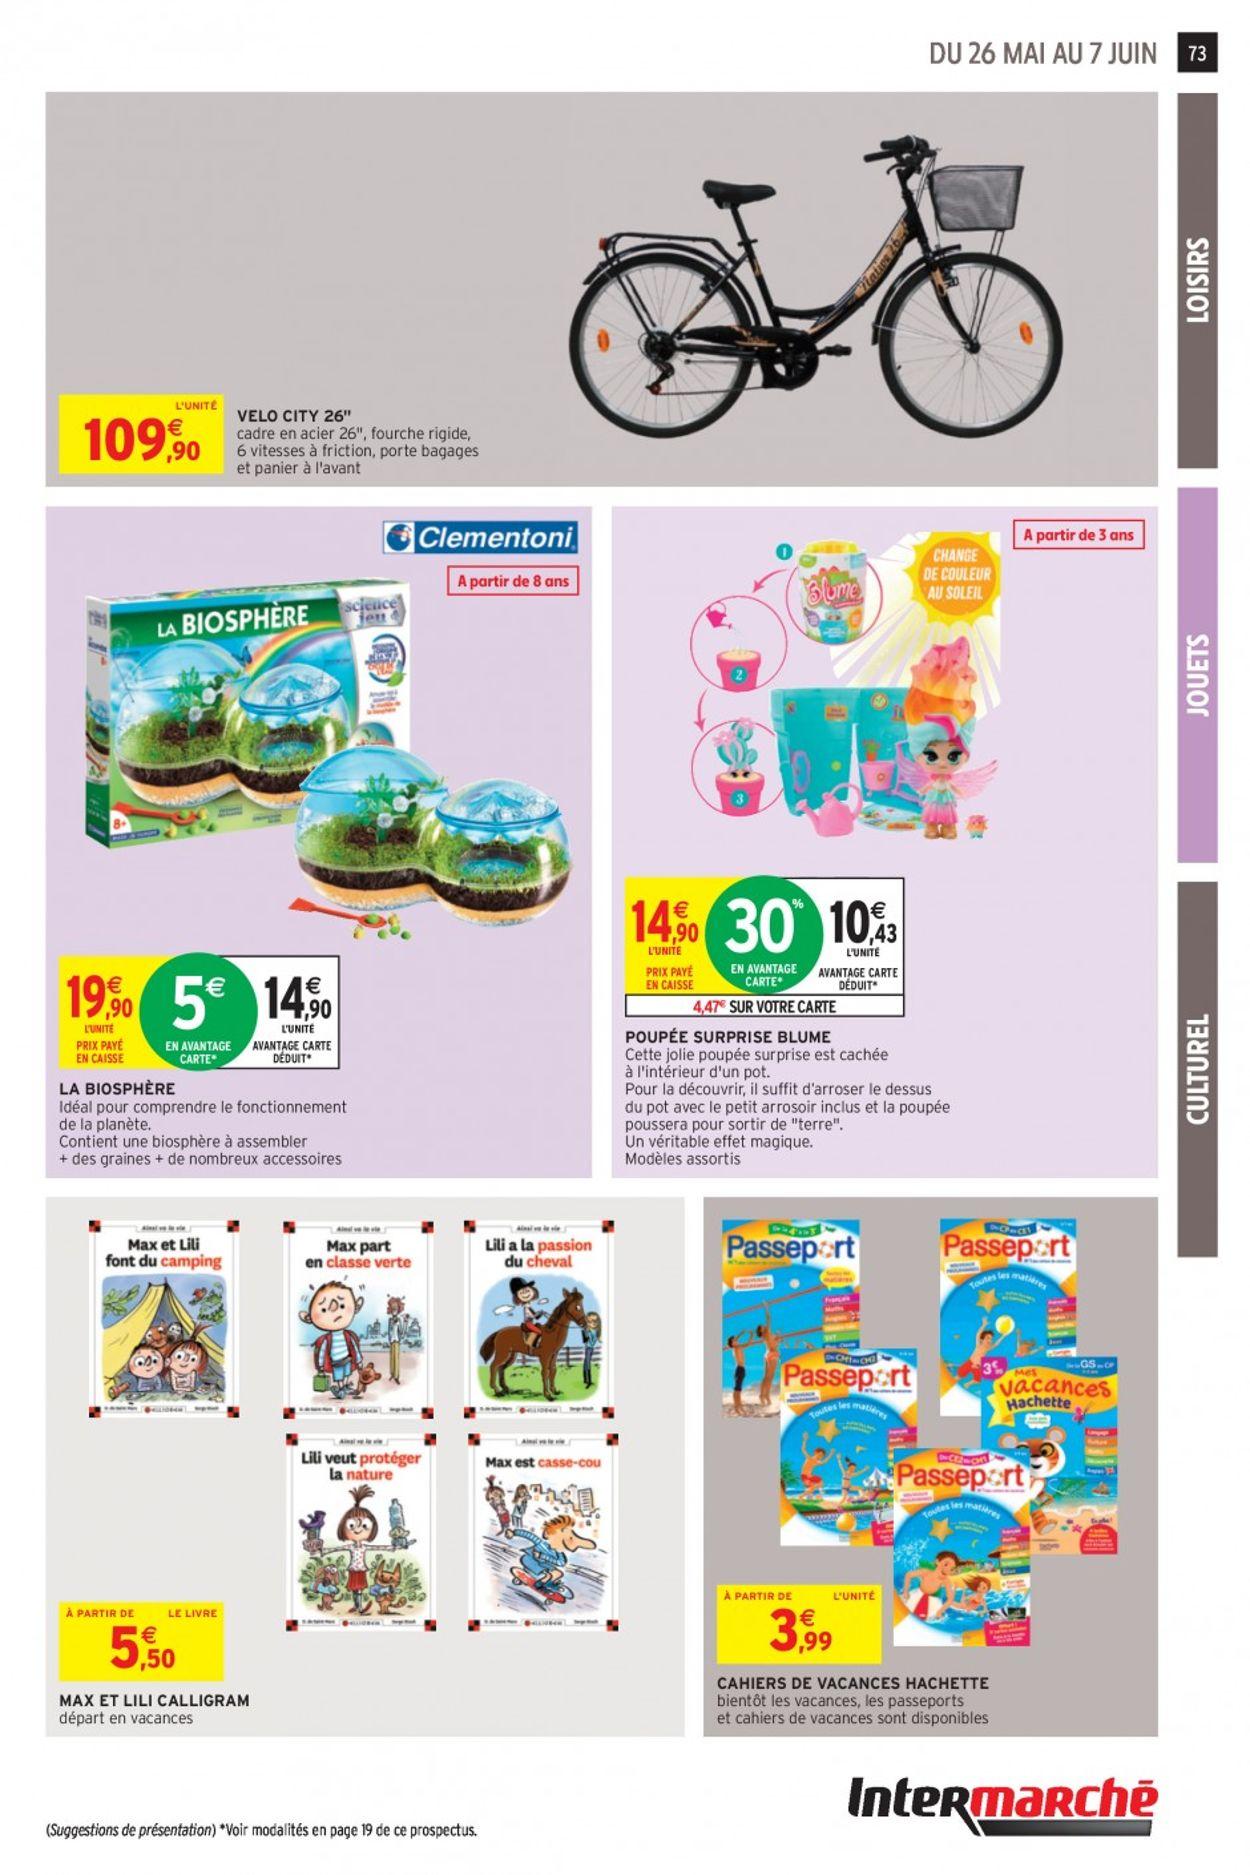 Intermarché Catalogue - 26.05-07.06.2020 (Page 70)